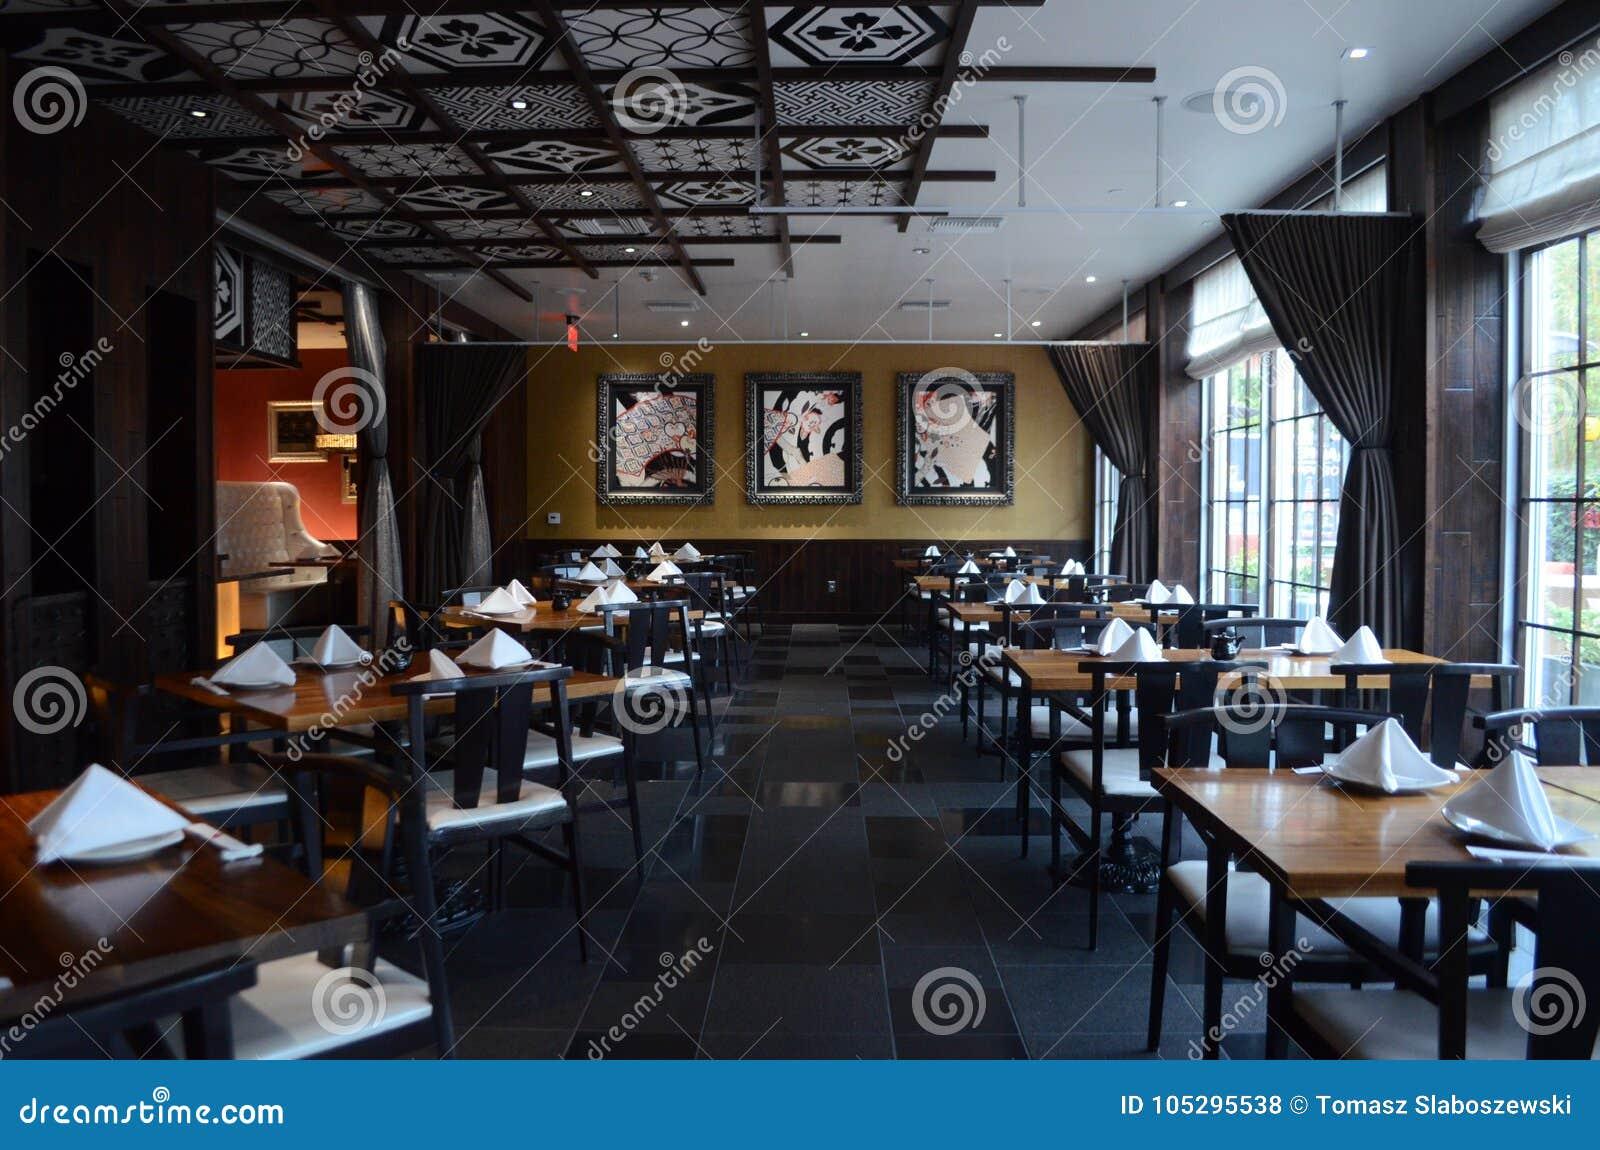 Japanese Sushi Restaurant Interior Design Stock Photo Image Of Common Magazine 105295538